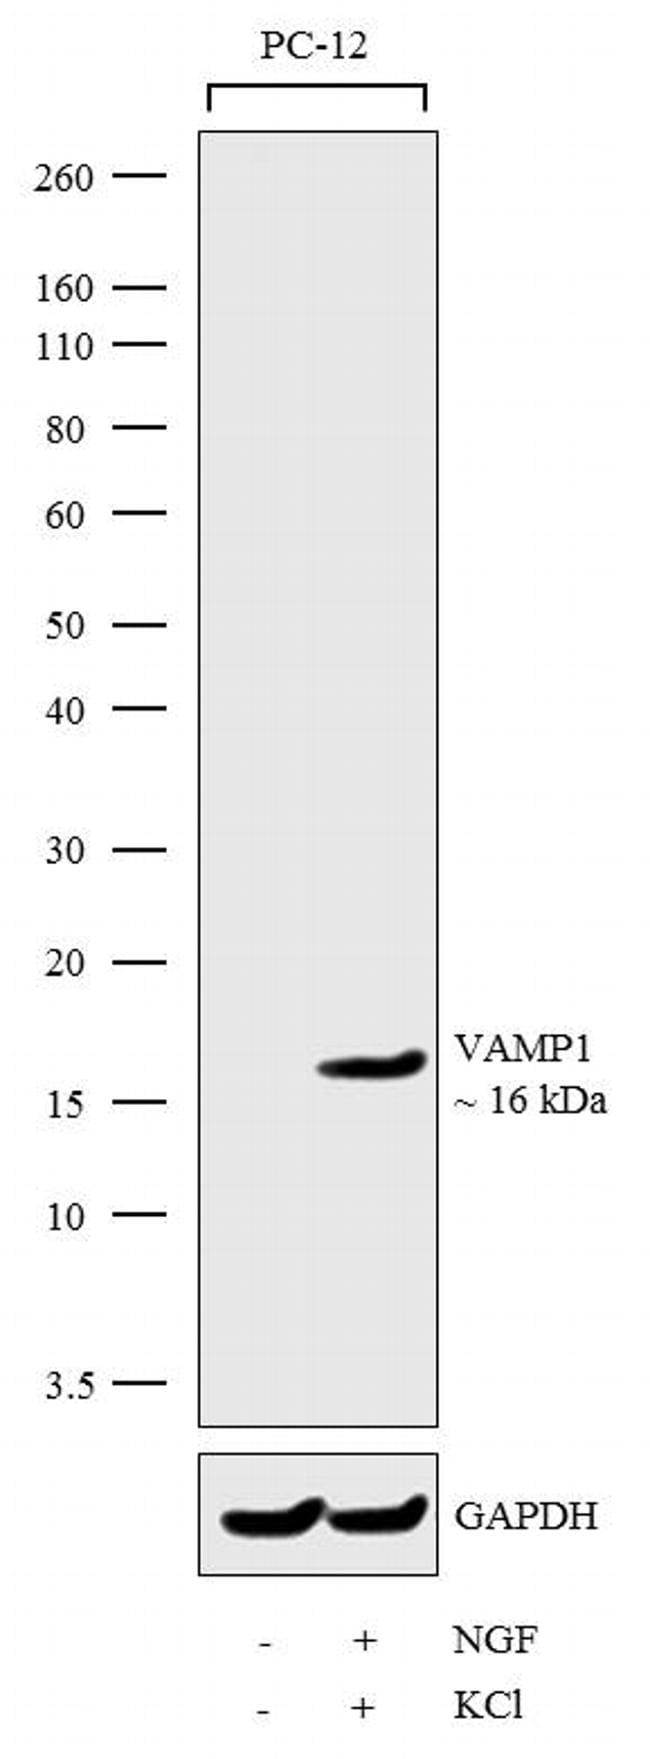 VAMP1 Antibody in Cell treatment